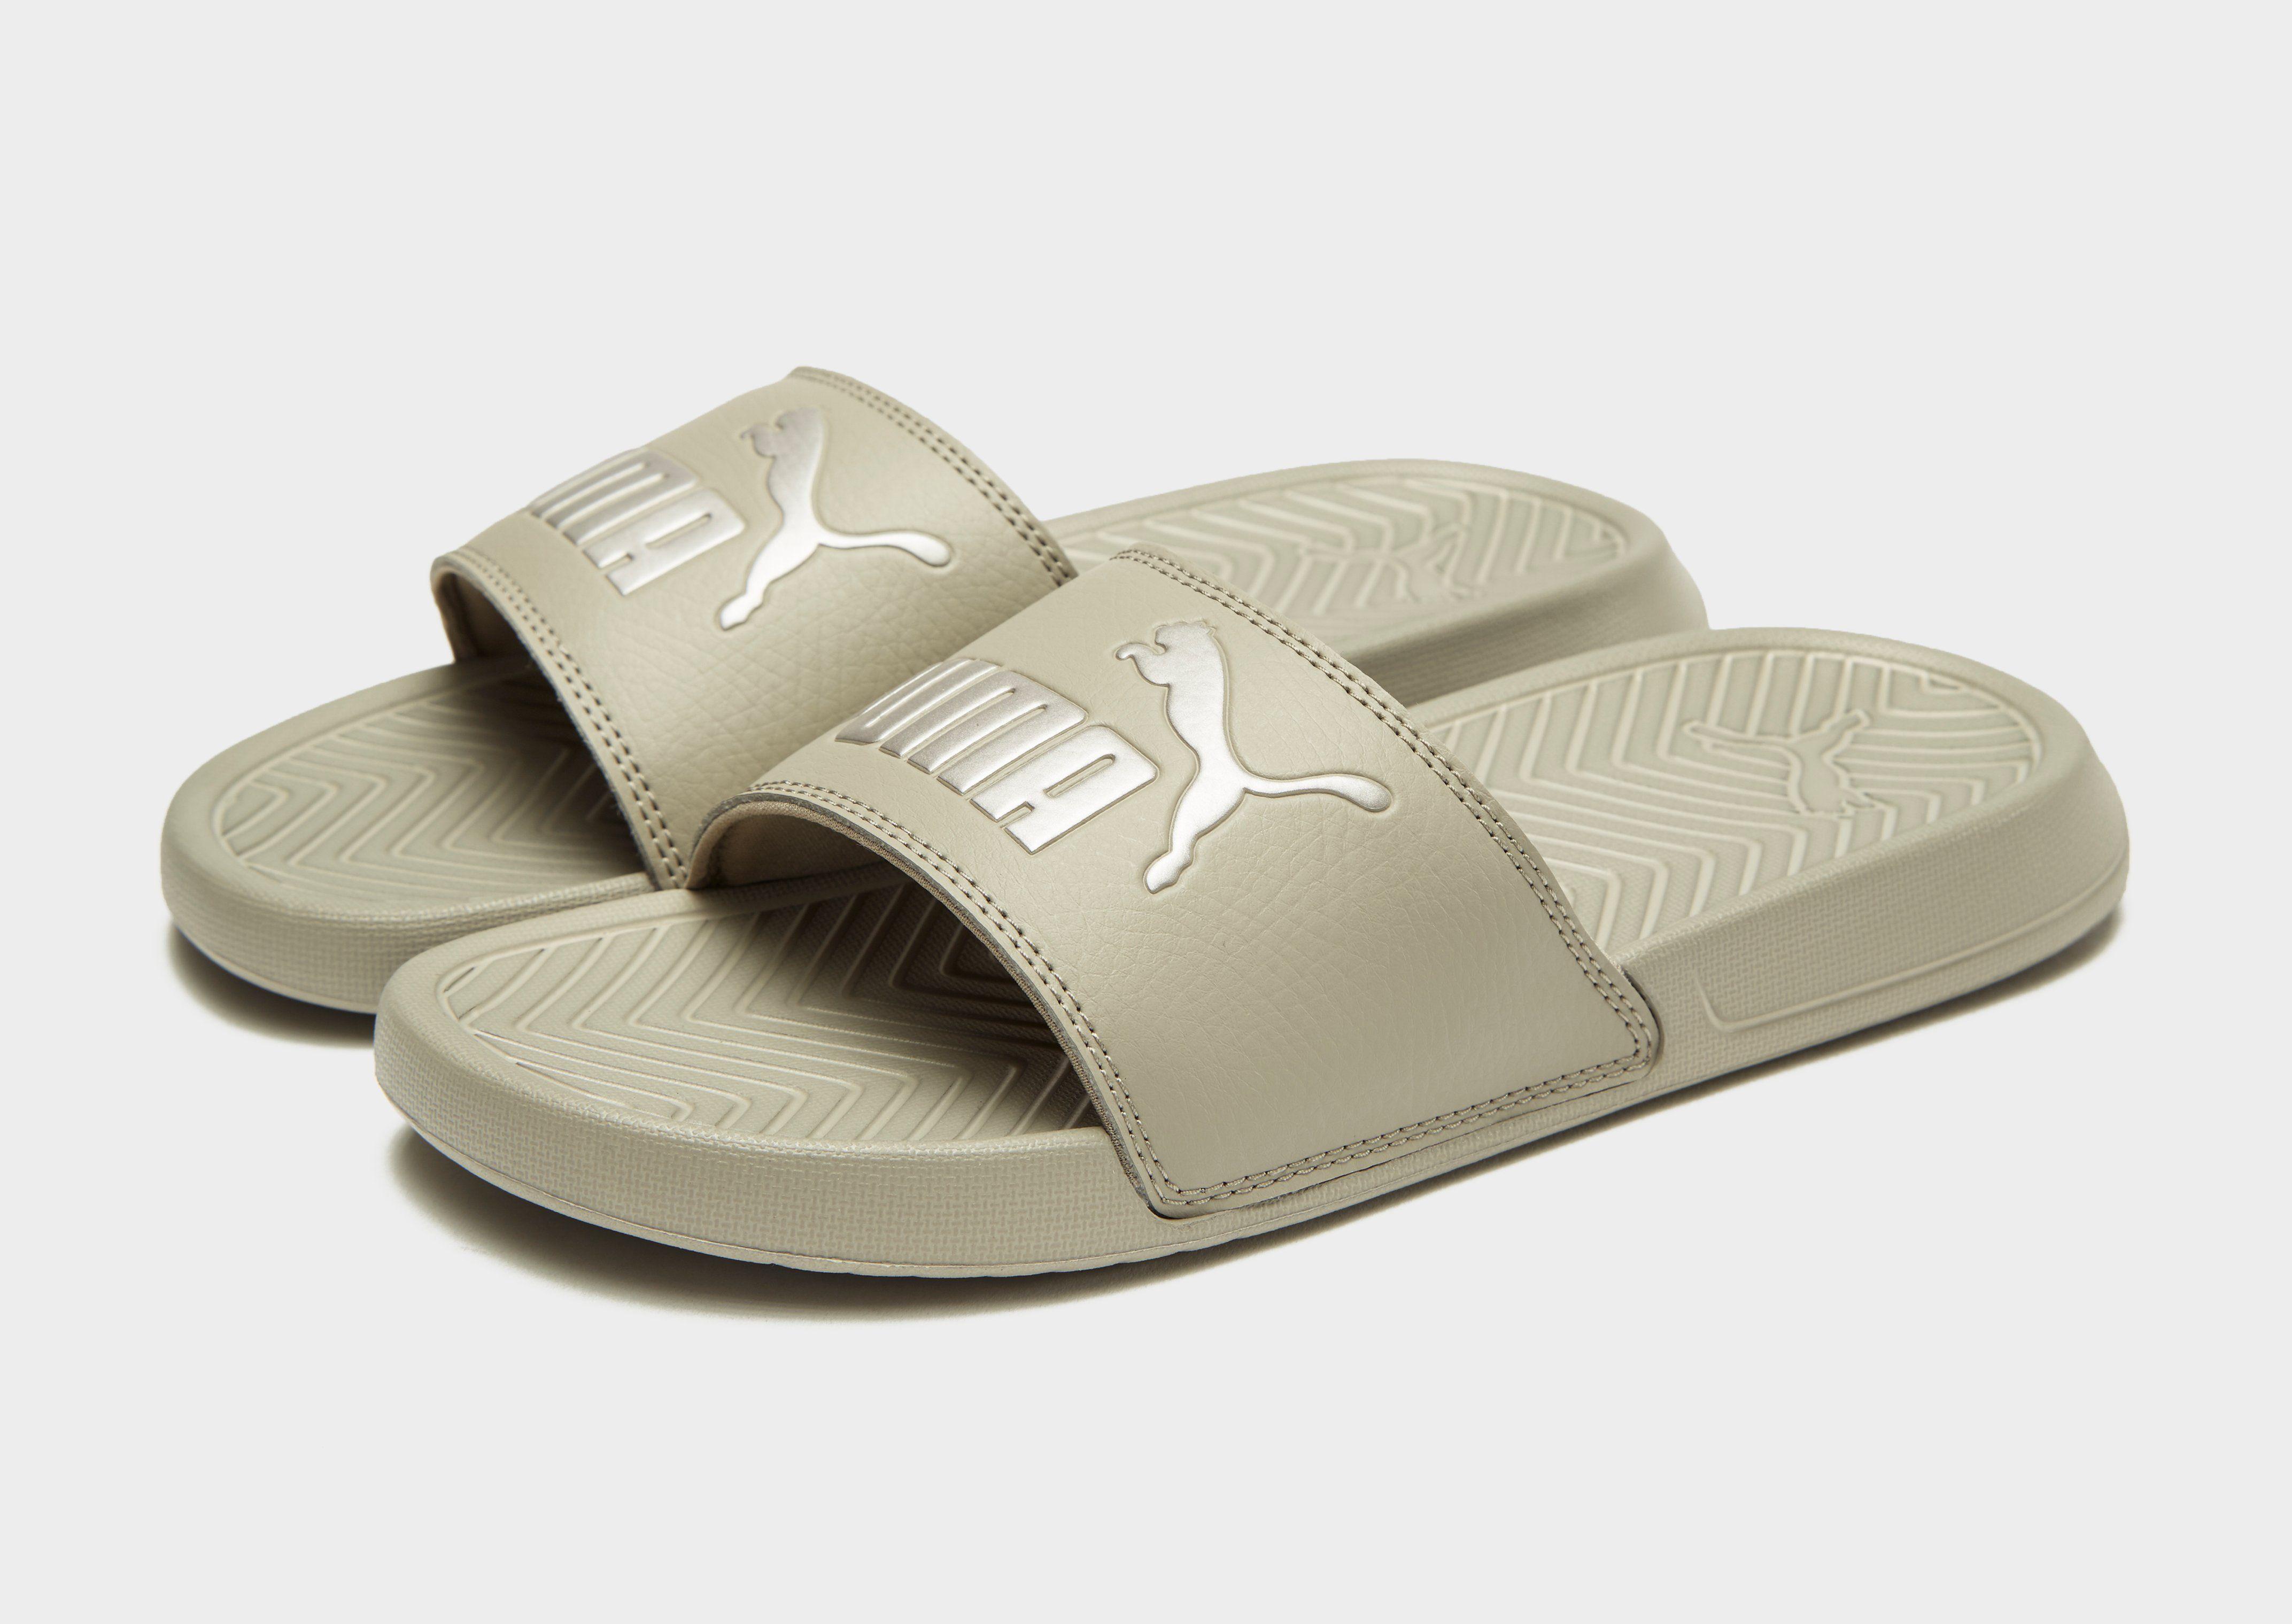 PUMA Sandales Femme